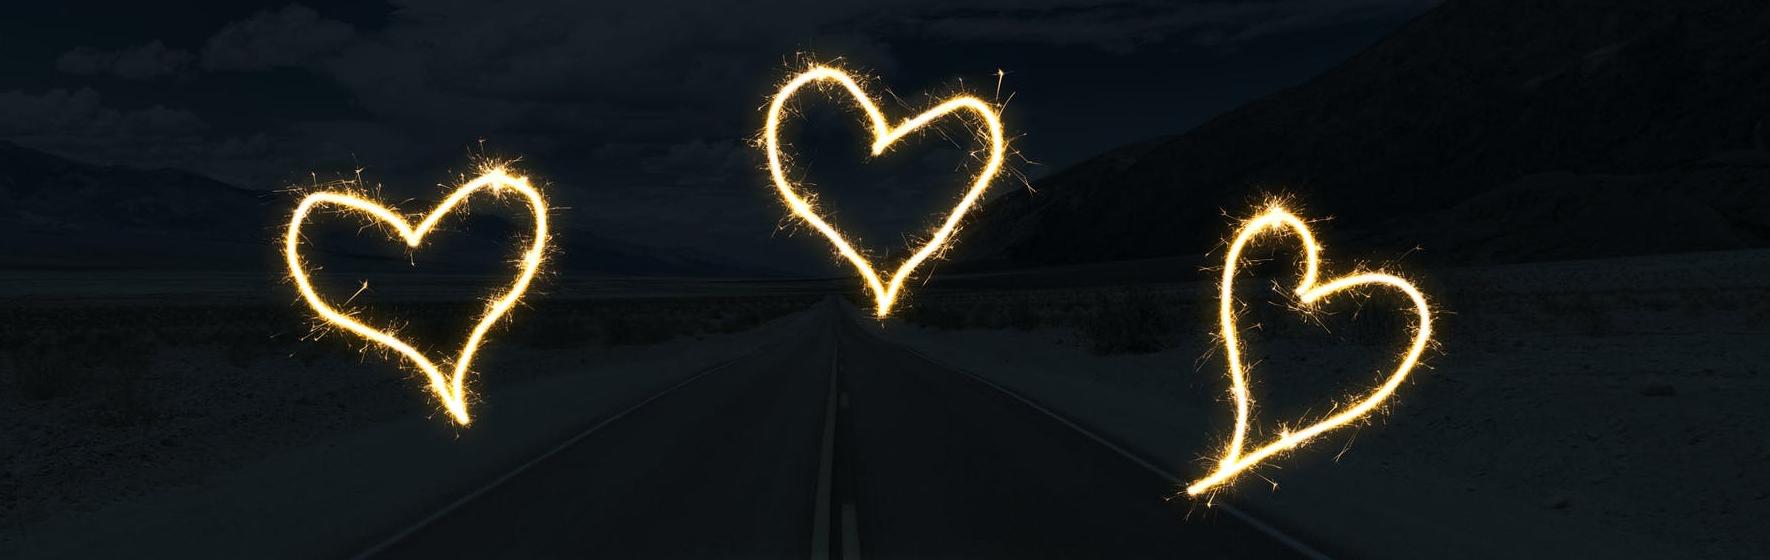 3 sparkler hearts